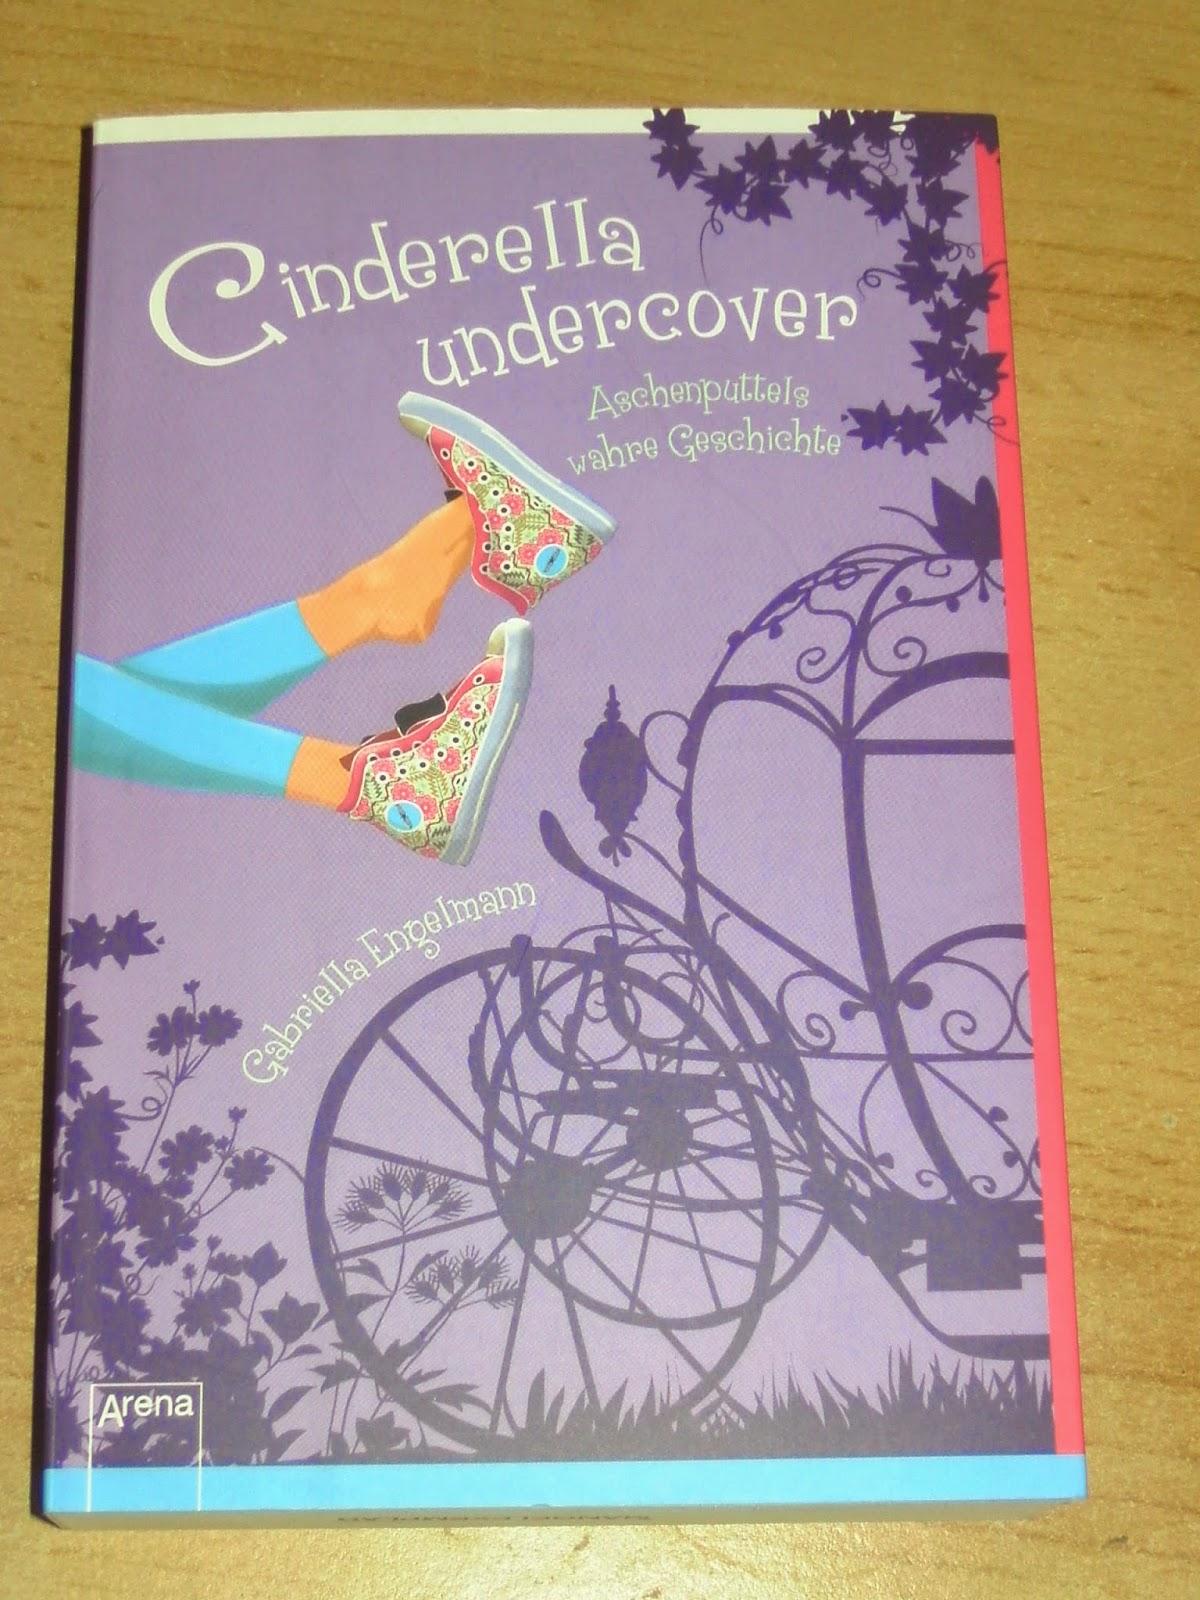 http://www.amazon.de/Cinderella-undercover-Gabriella-Engelmann-ebook/dp/B00BBOWN6I/ref=sr_1_1?s=books&ie=UTF8&qid=1442310277&sr=1-1&keywords=cinderella+undercover